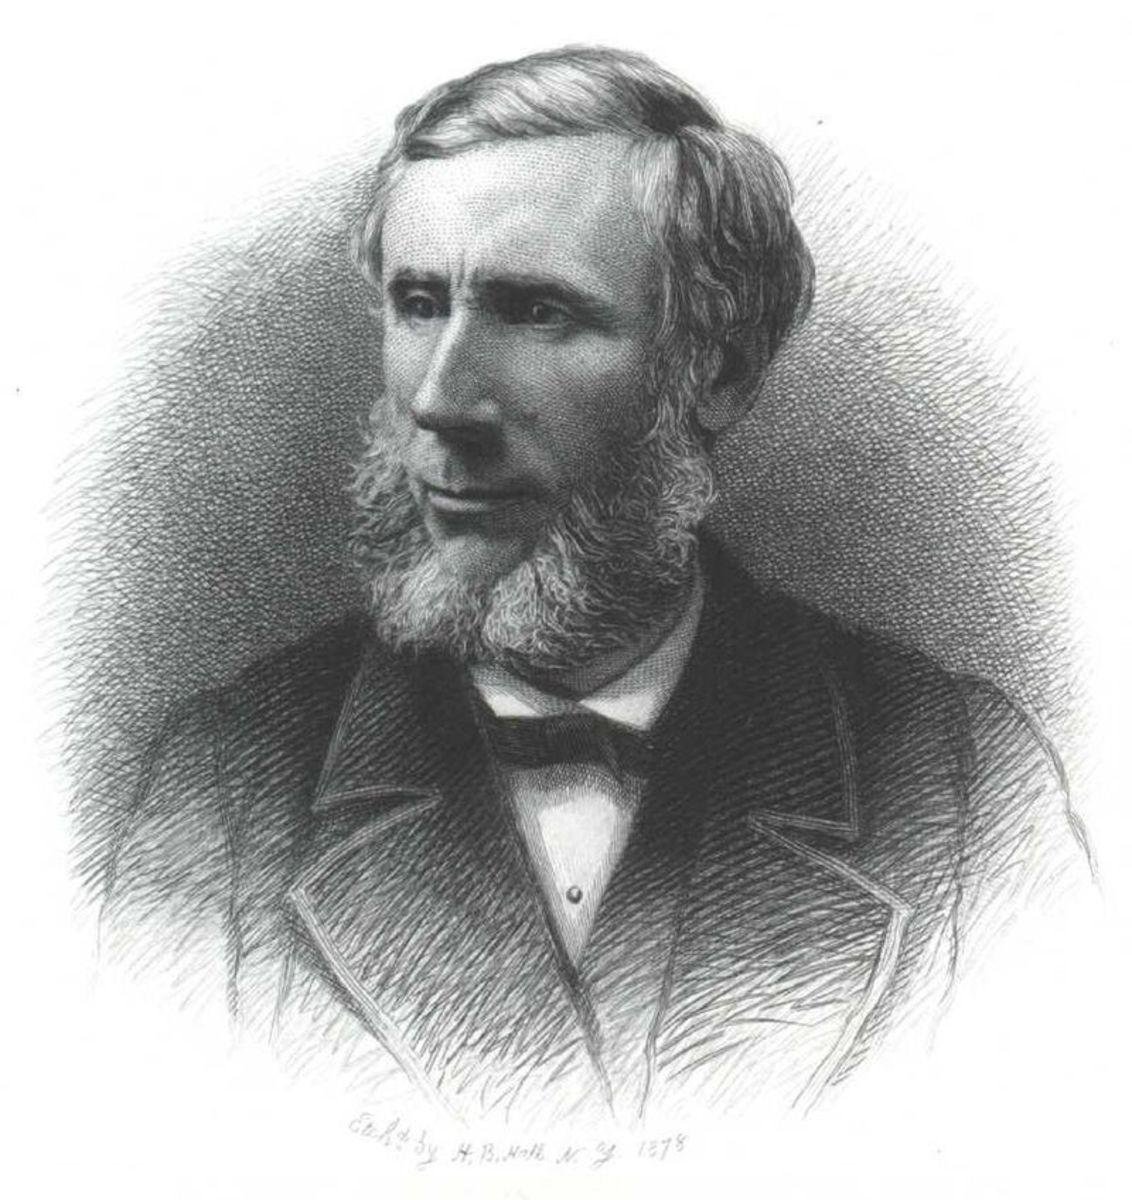 John Tyndall 1820-1898